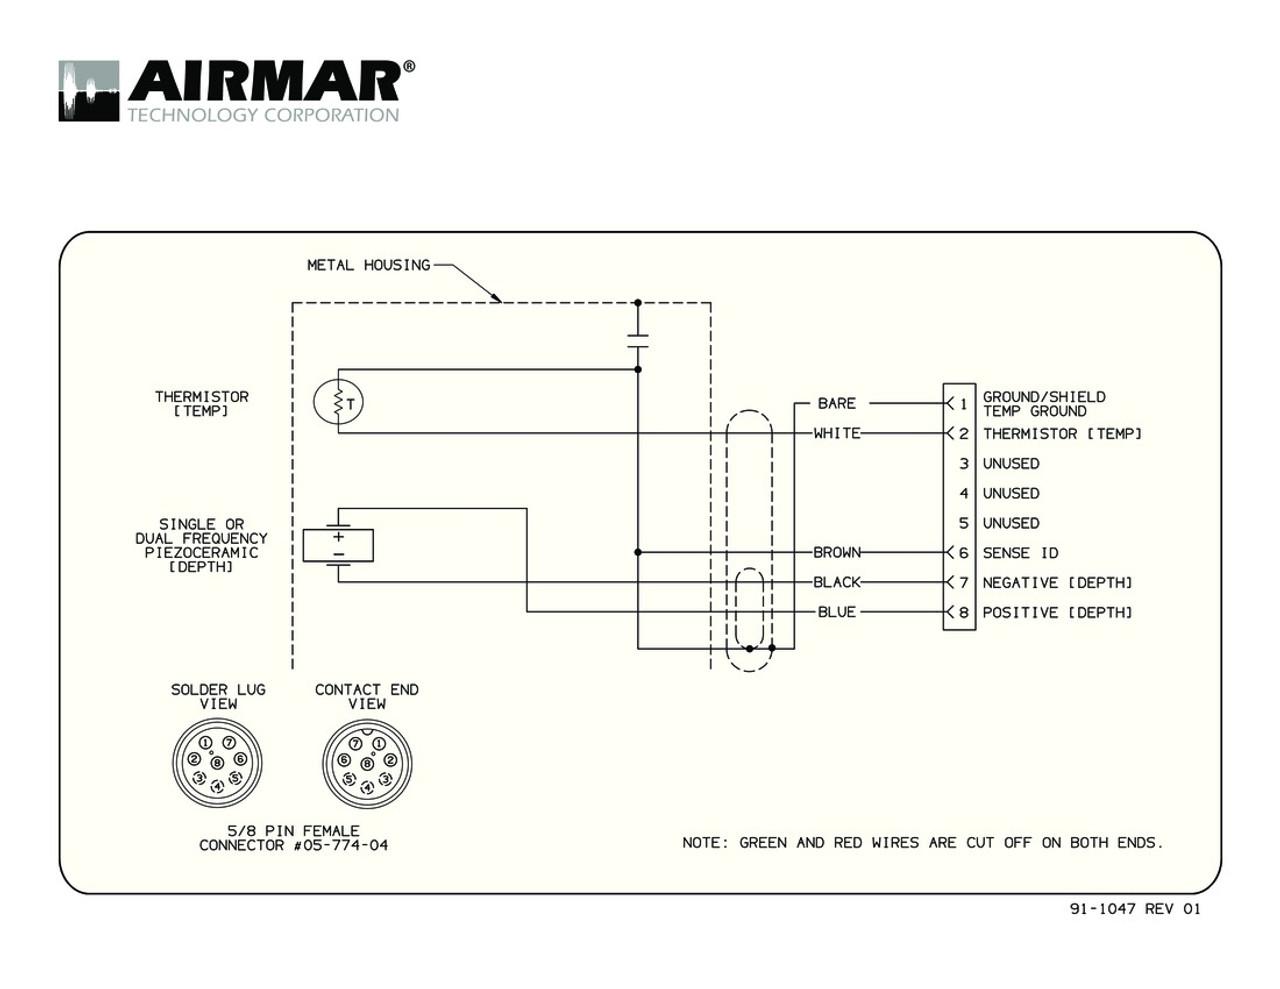 small resolution of airmar wiring diagram garmin b117 8 pin d t blue bottle marine wiring diagram for garmin fishfinder 90 wiring diagram garmin